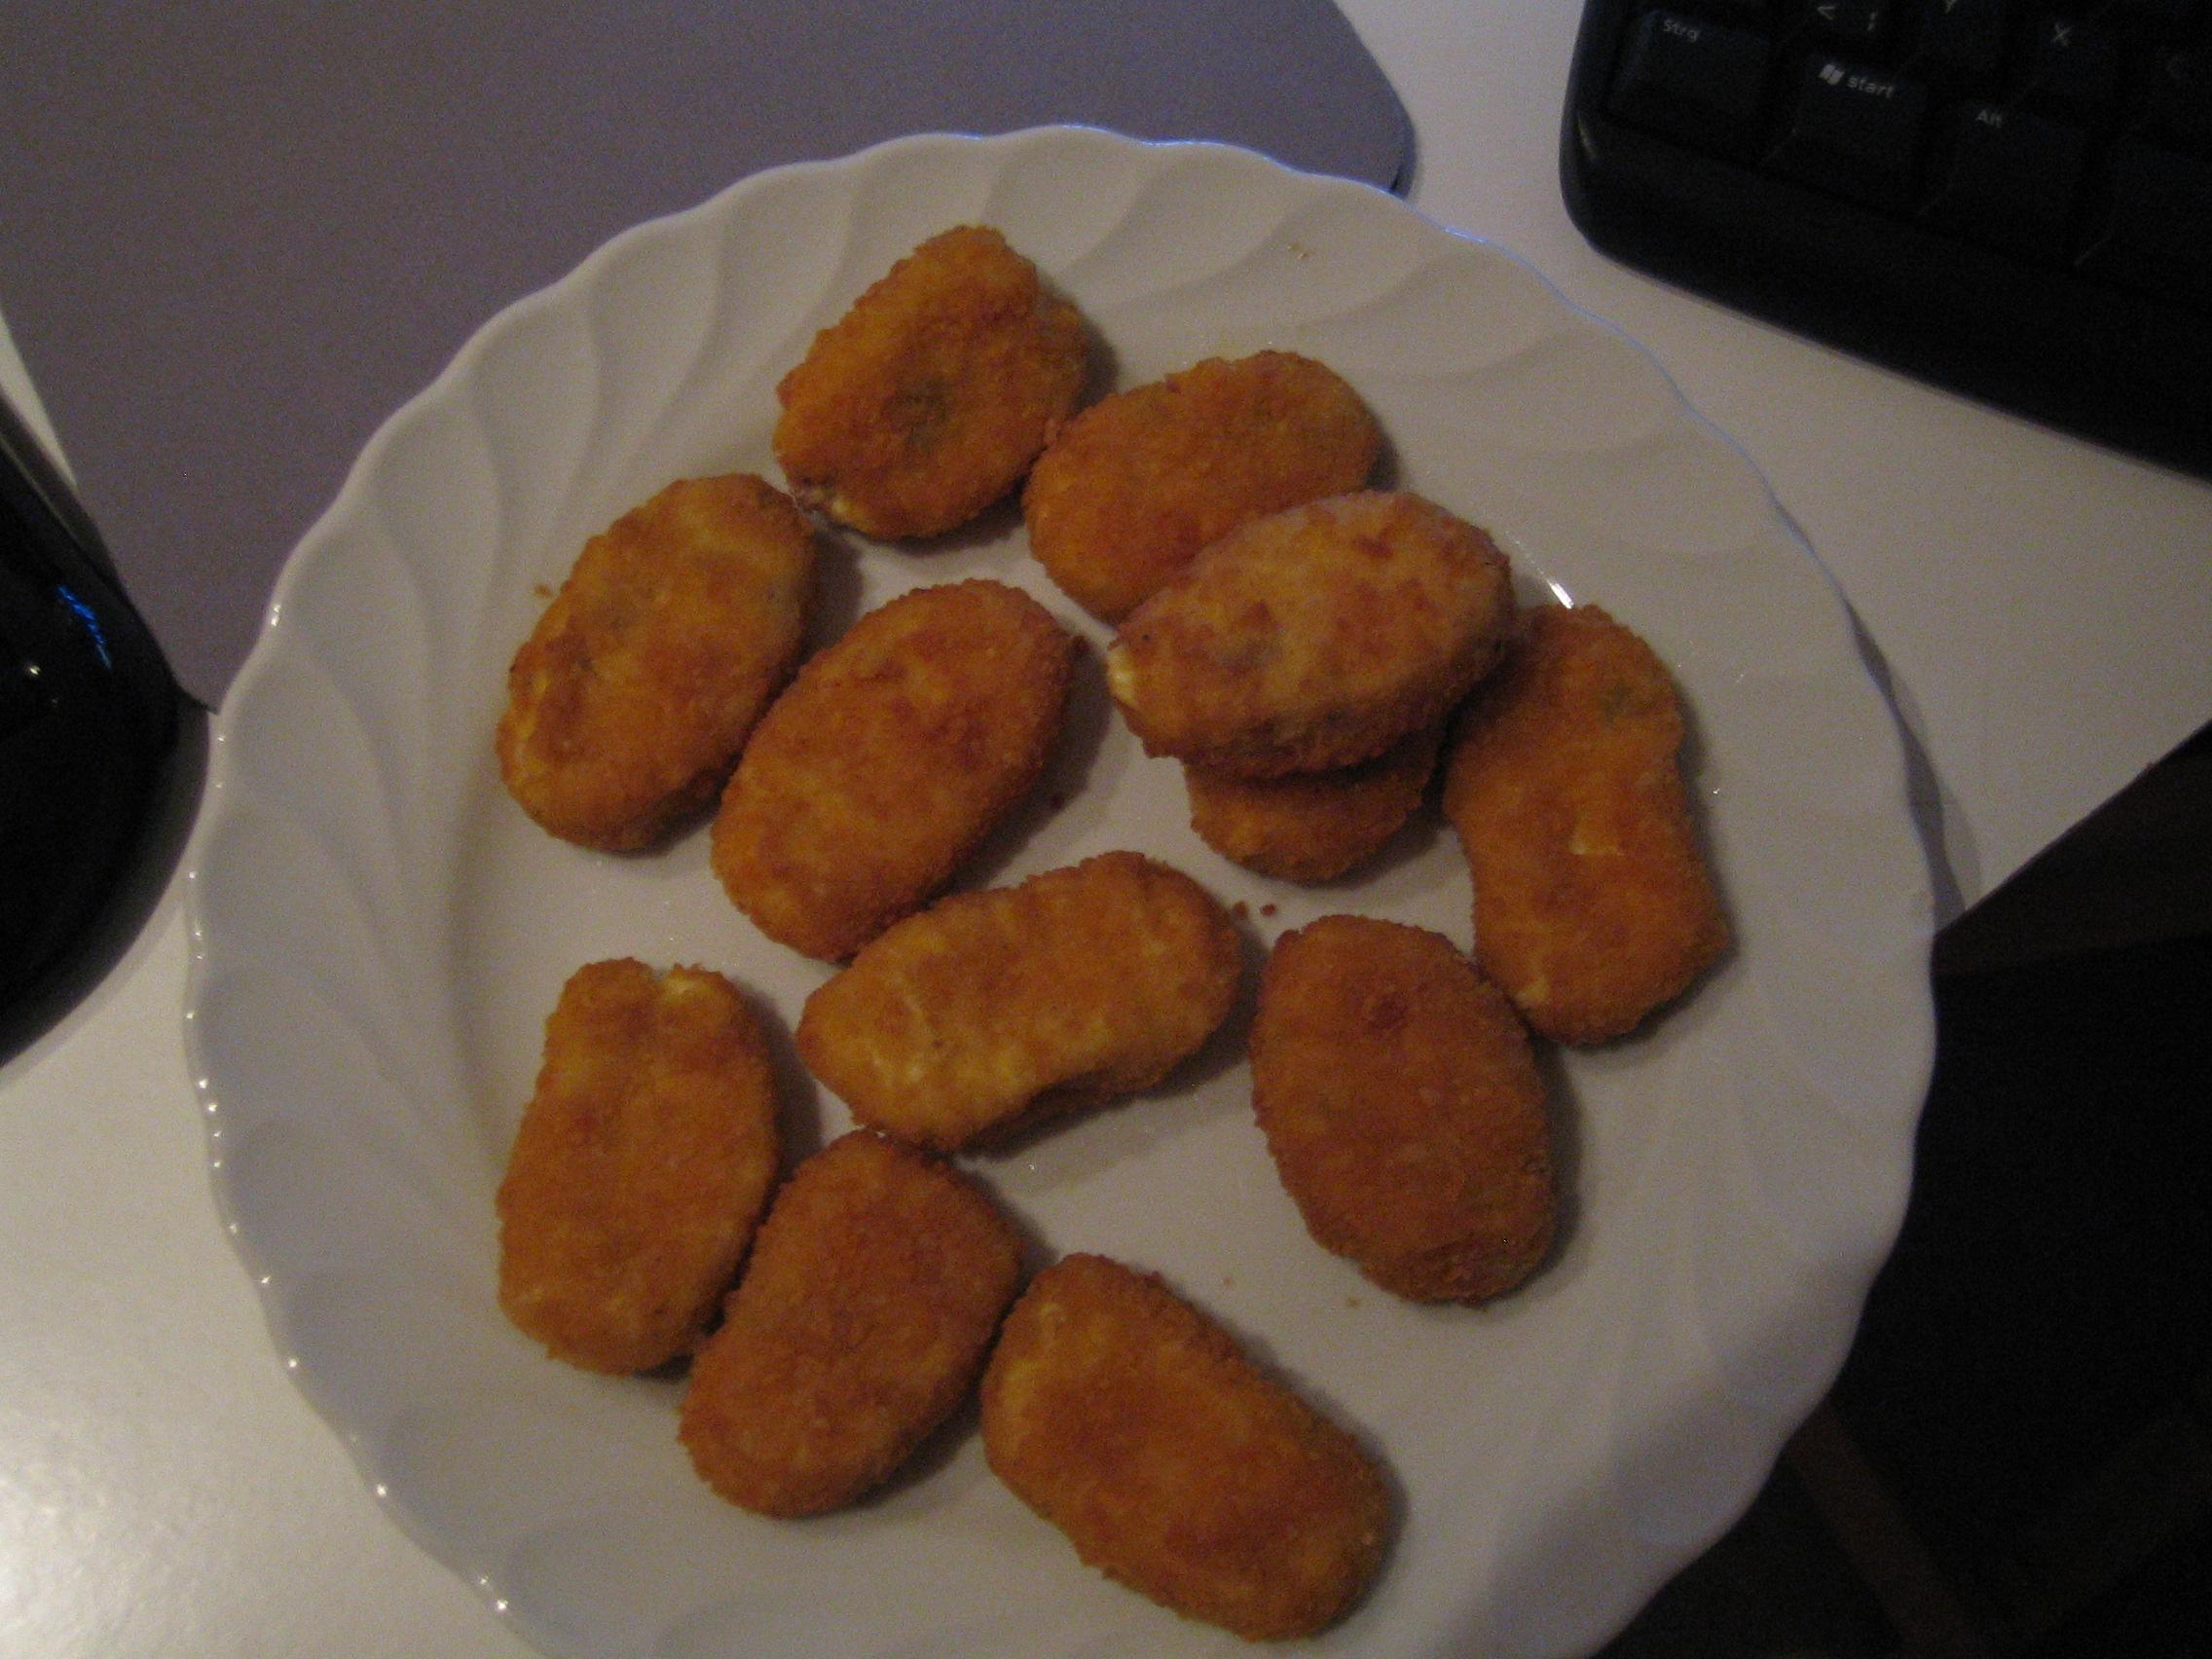 https://foodloader.net/Eddie_2009-01-03_Chilli_Cheese_Snack.jpg